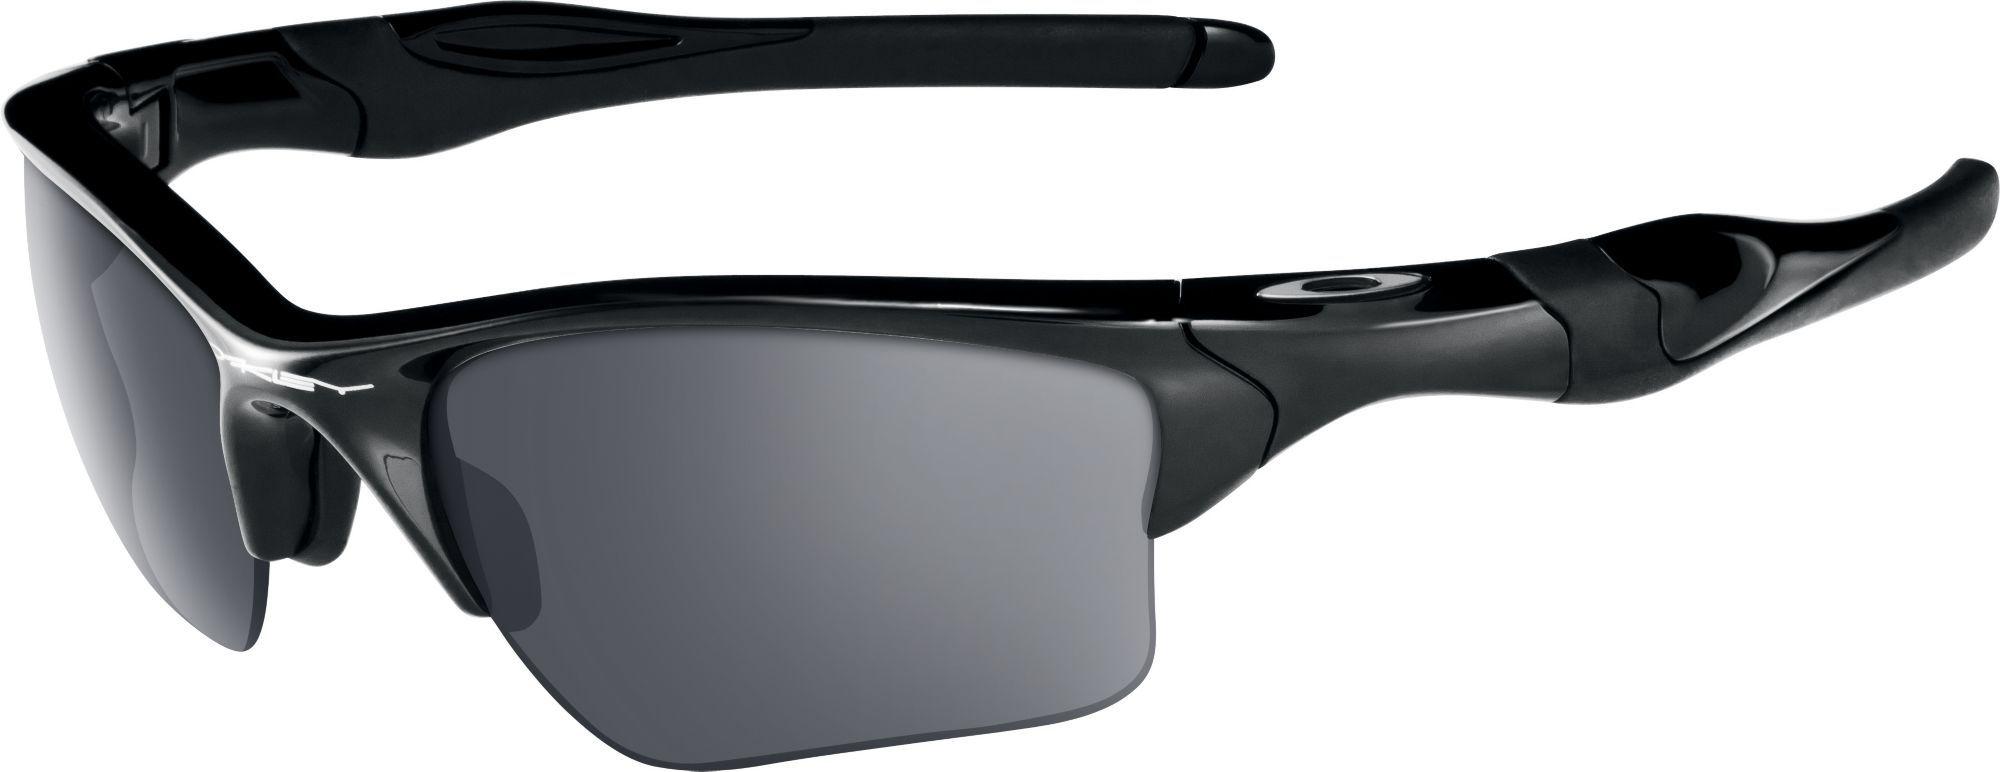 08e62105af Oakley Adult Half Jacket 2.0 XL Sunglasses